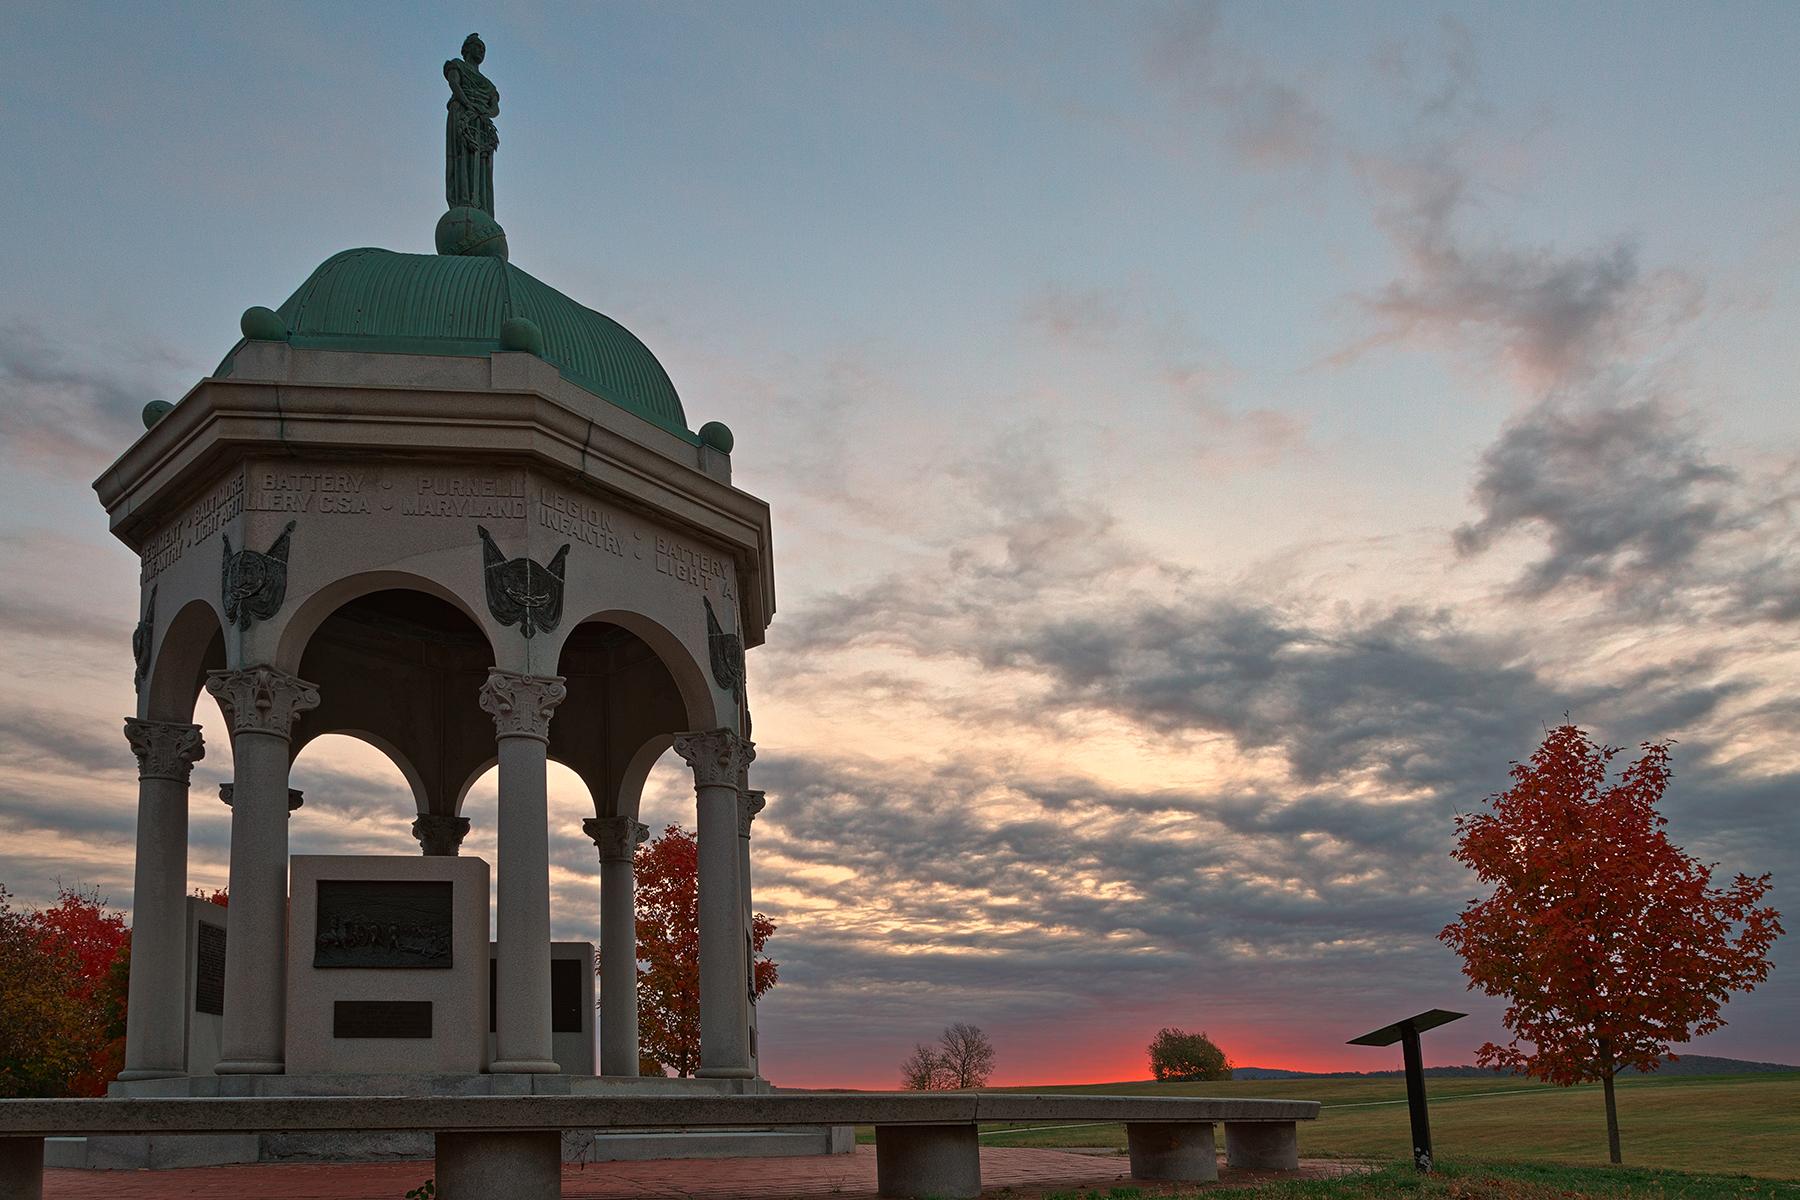 Antietam Dawn - HDR, America, Scene, Roof, Red, HQ Photo